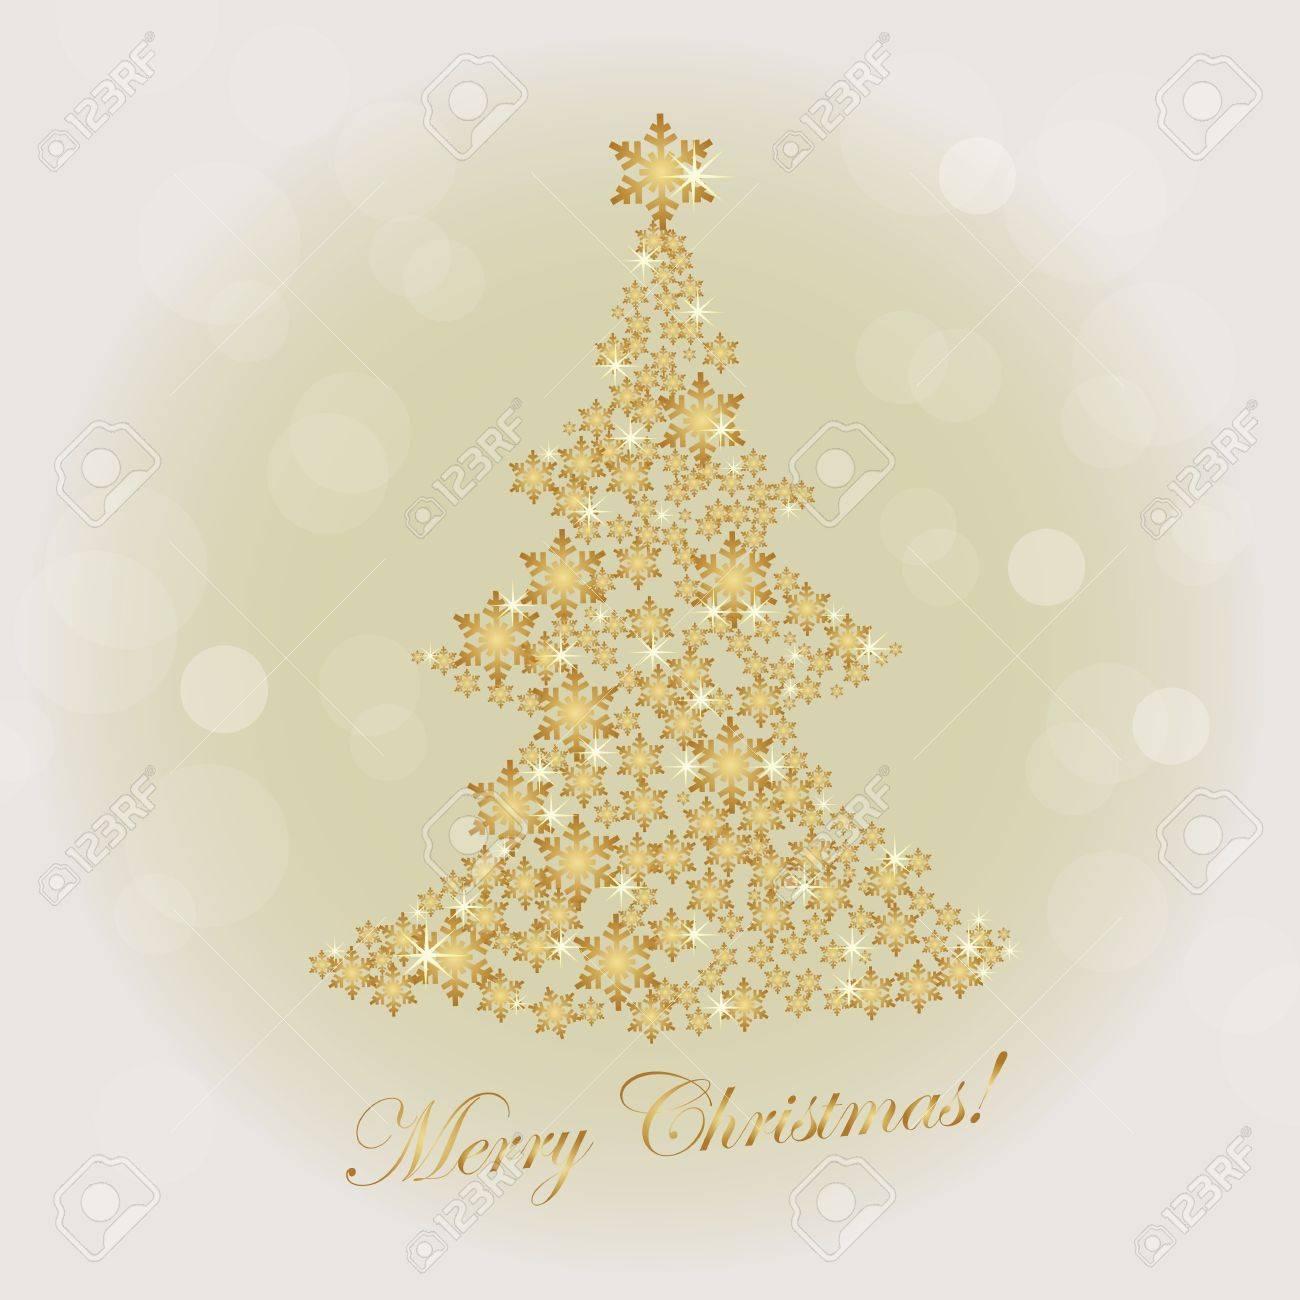 christmas illumination background Stock Vector - 13178611